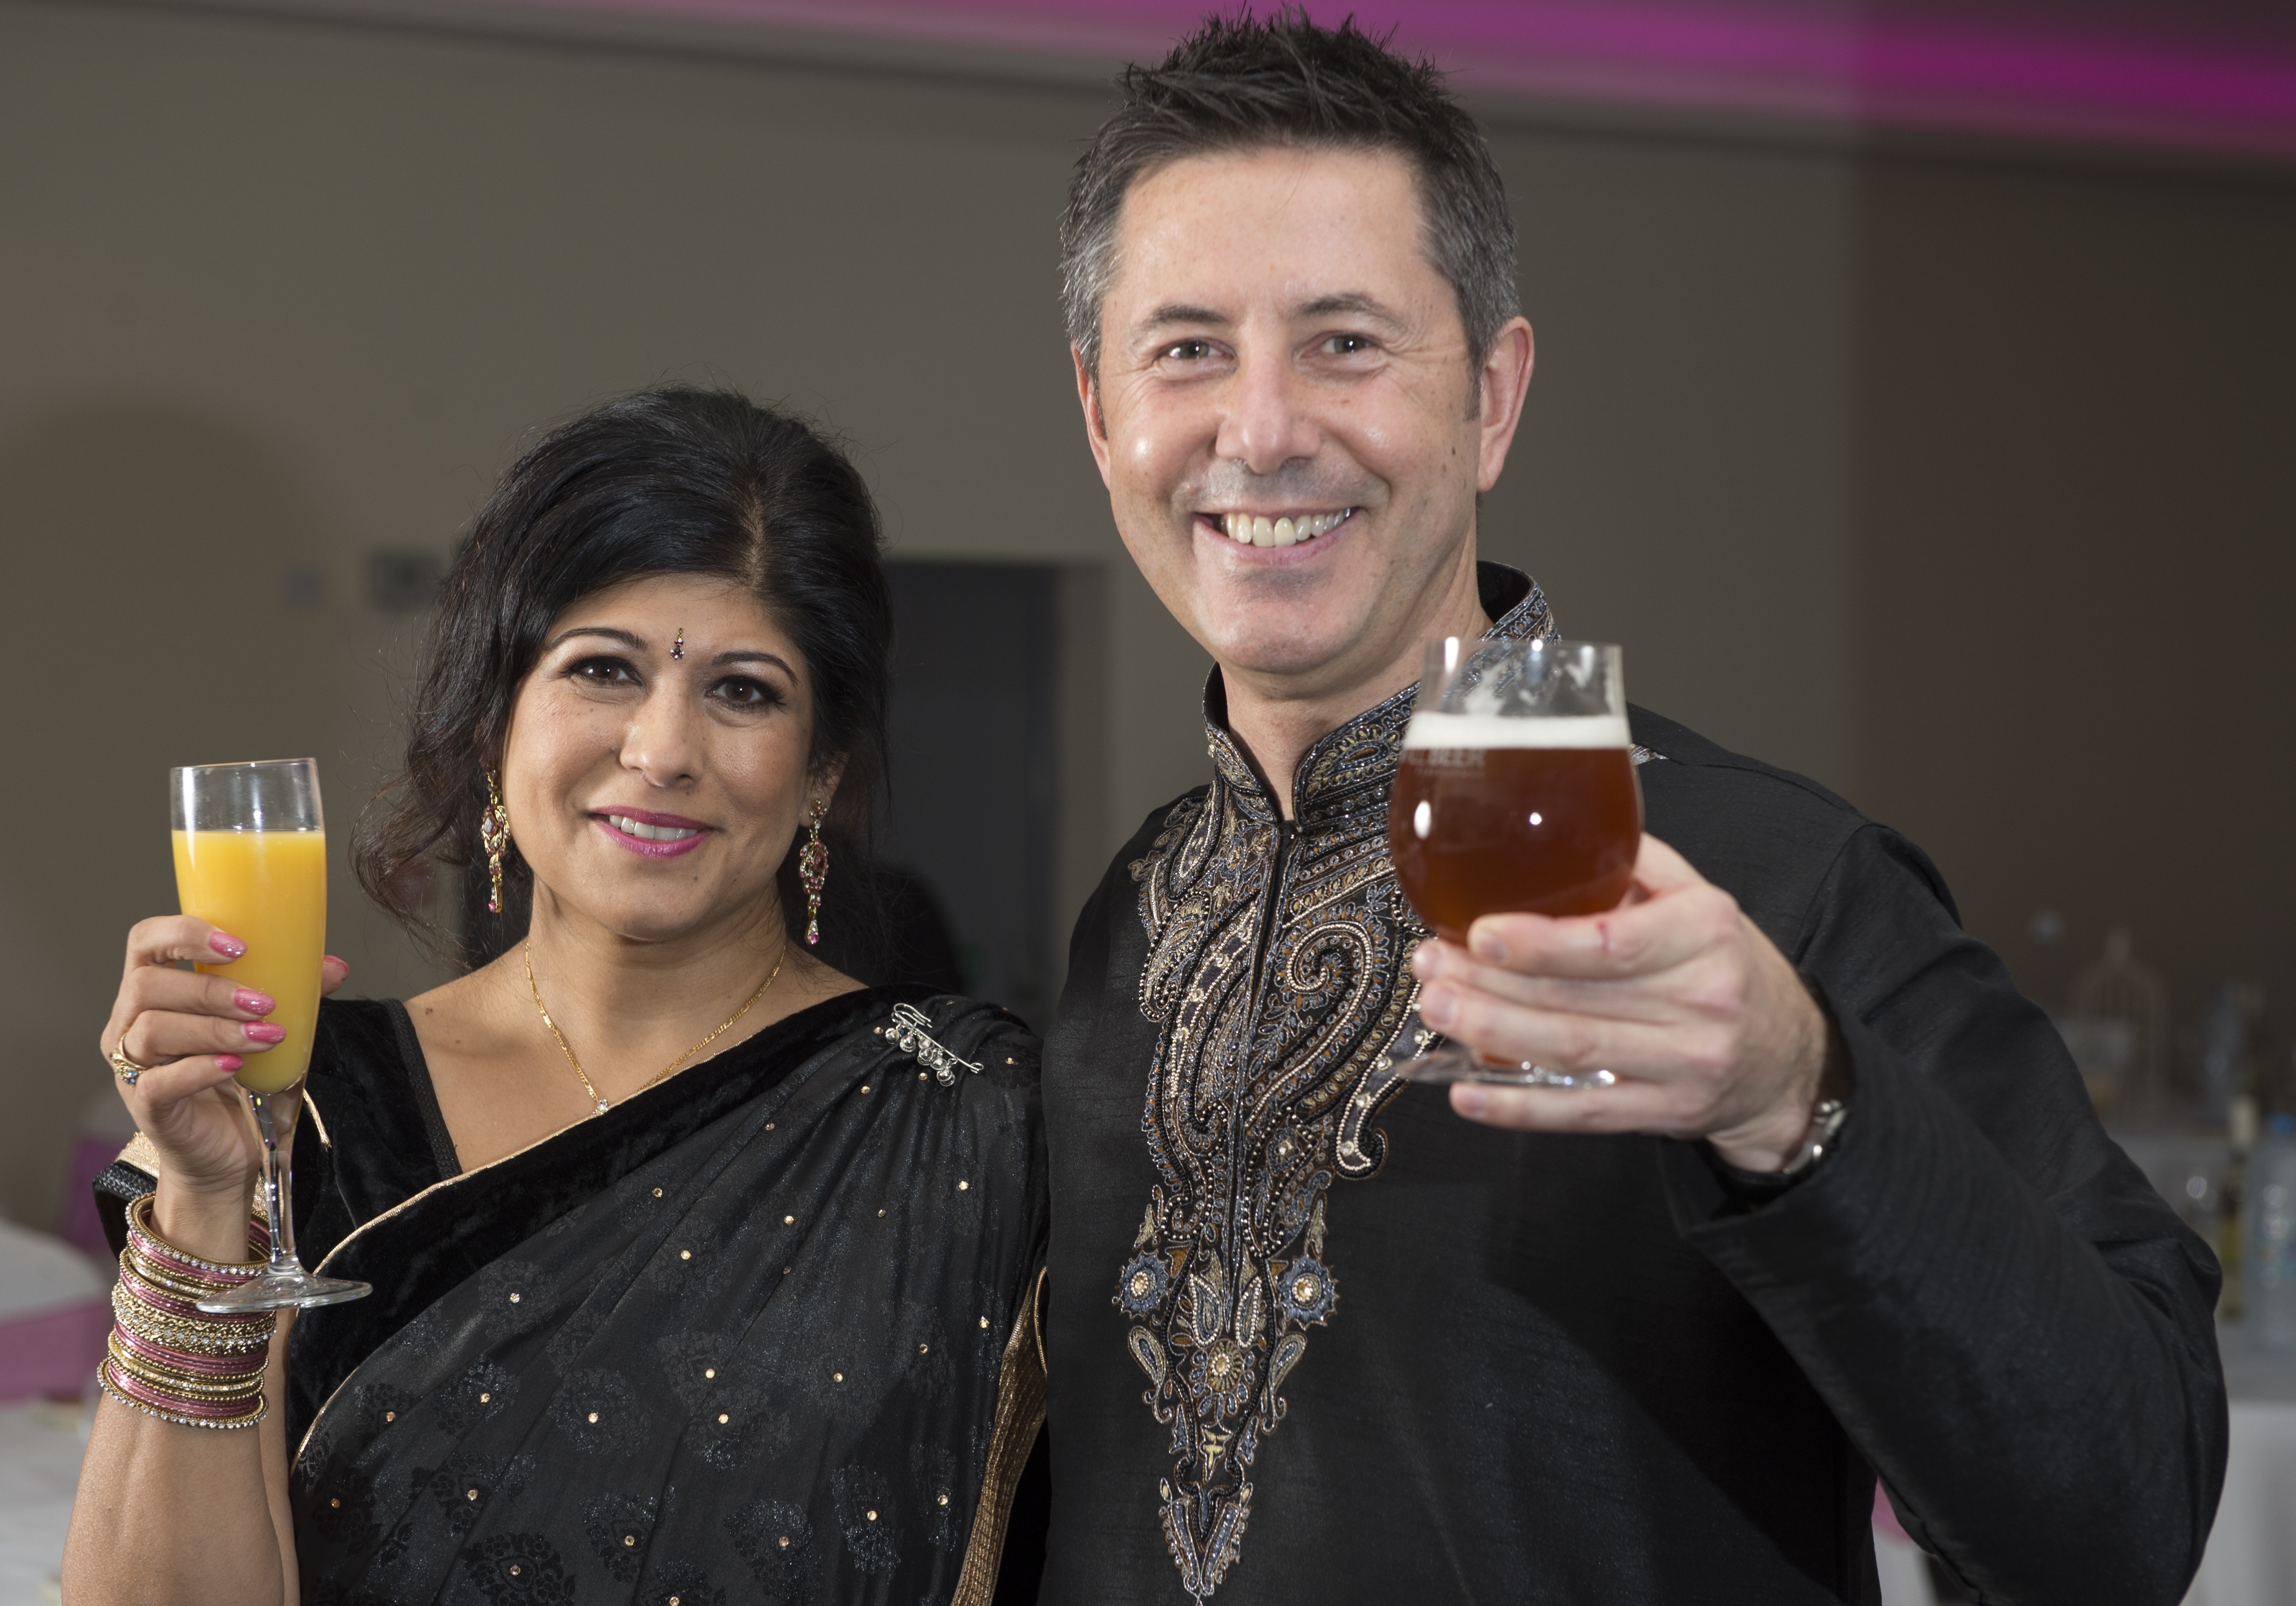 Bhayani Law Bollywood Ball held at Arooj, Attercliffe Road in Sheffield Saturday 7th November 2015 Jay Bhayani and Alex Barlow of All Beer